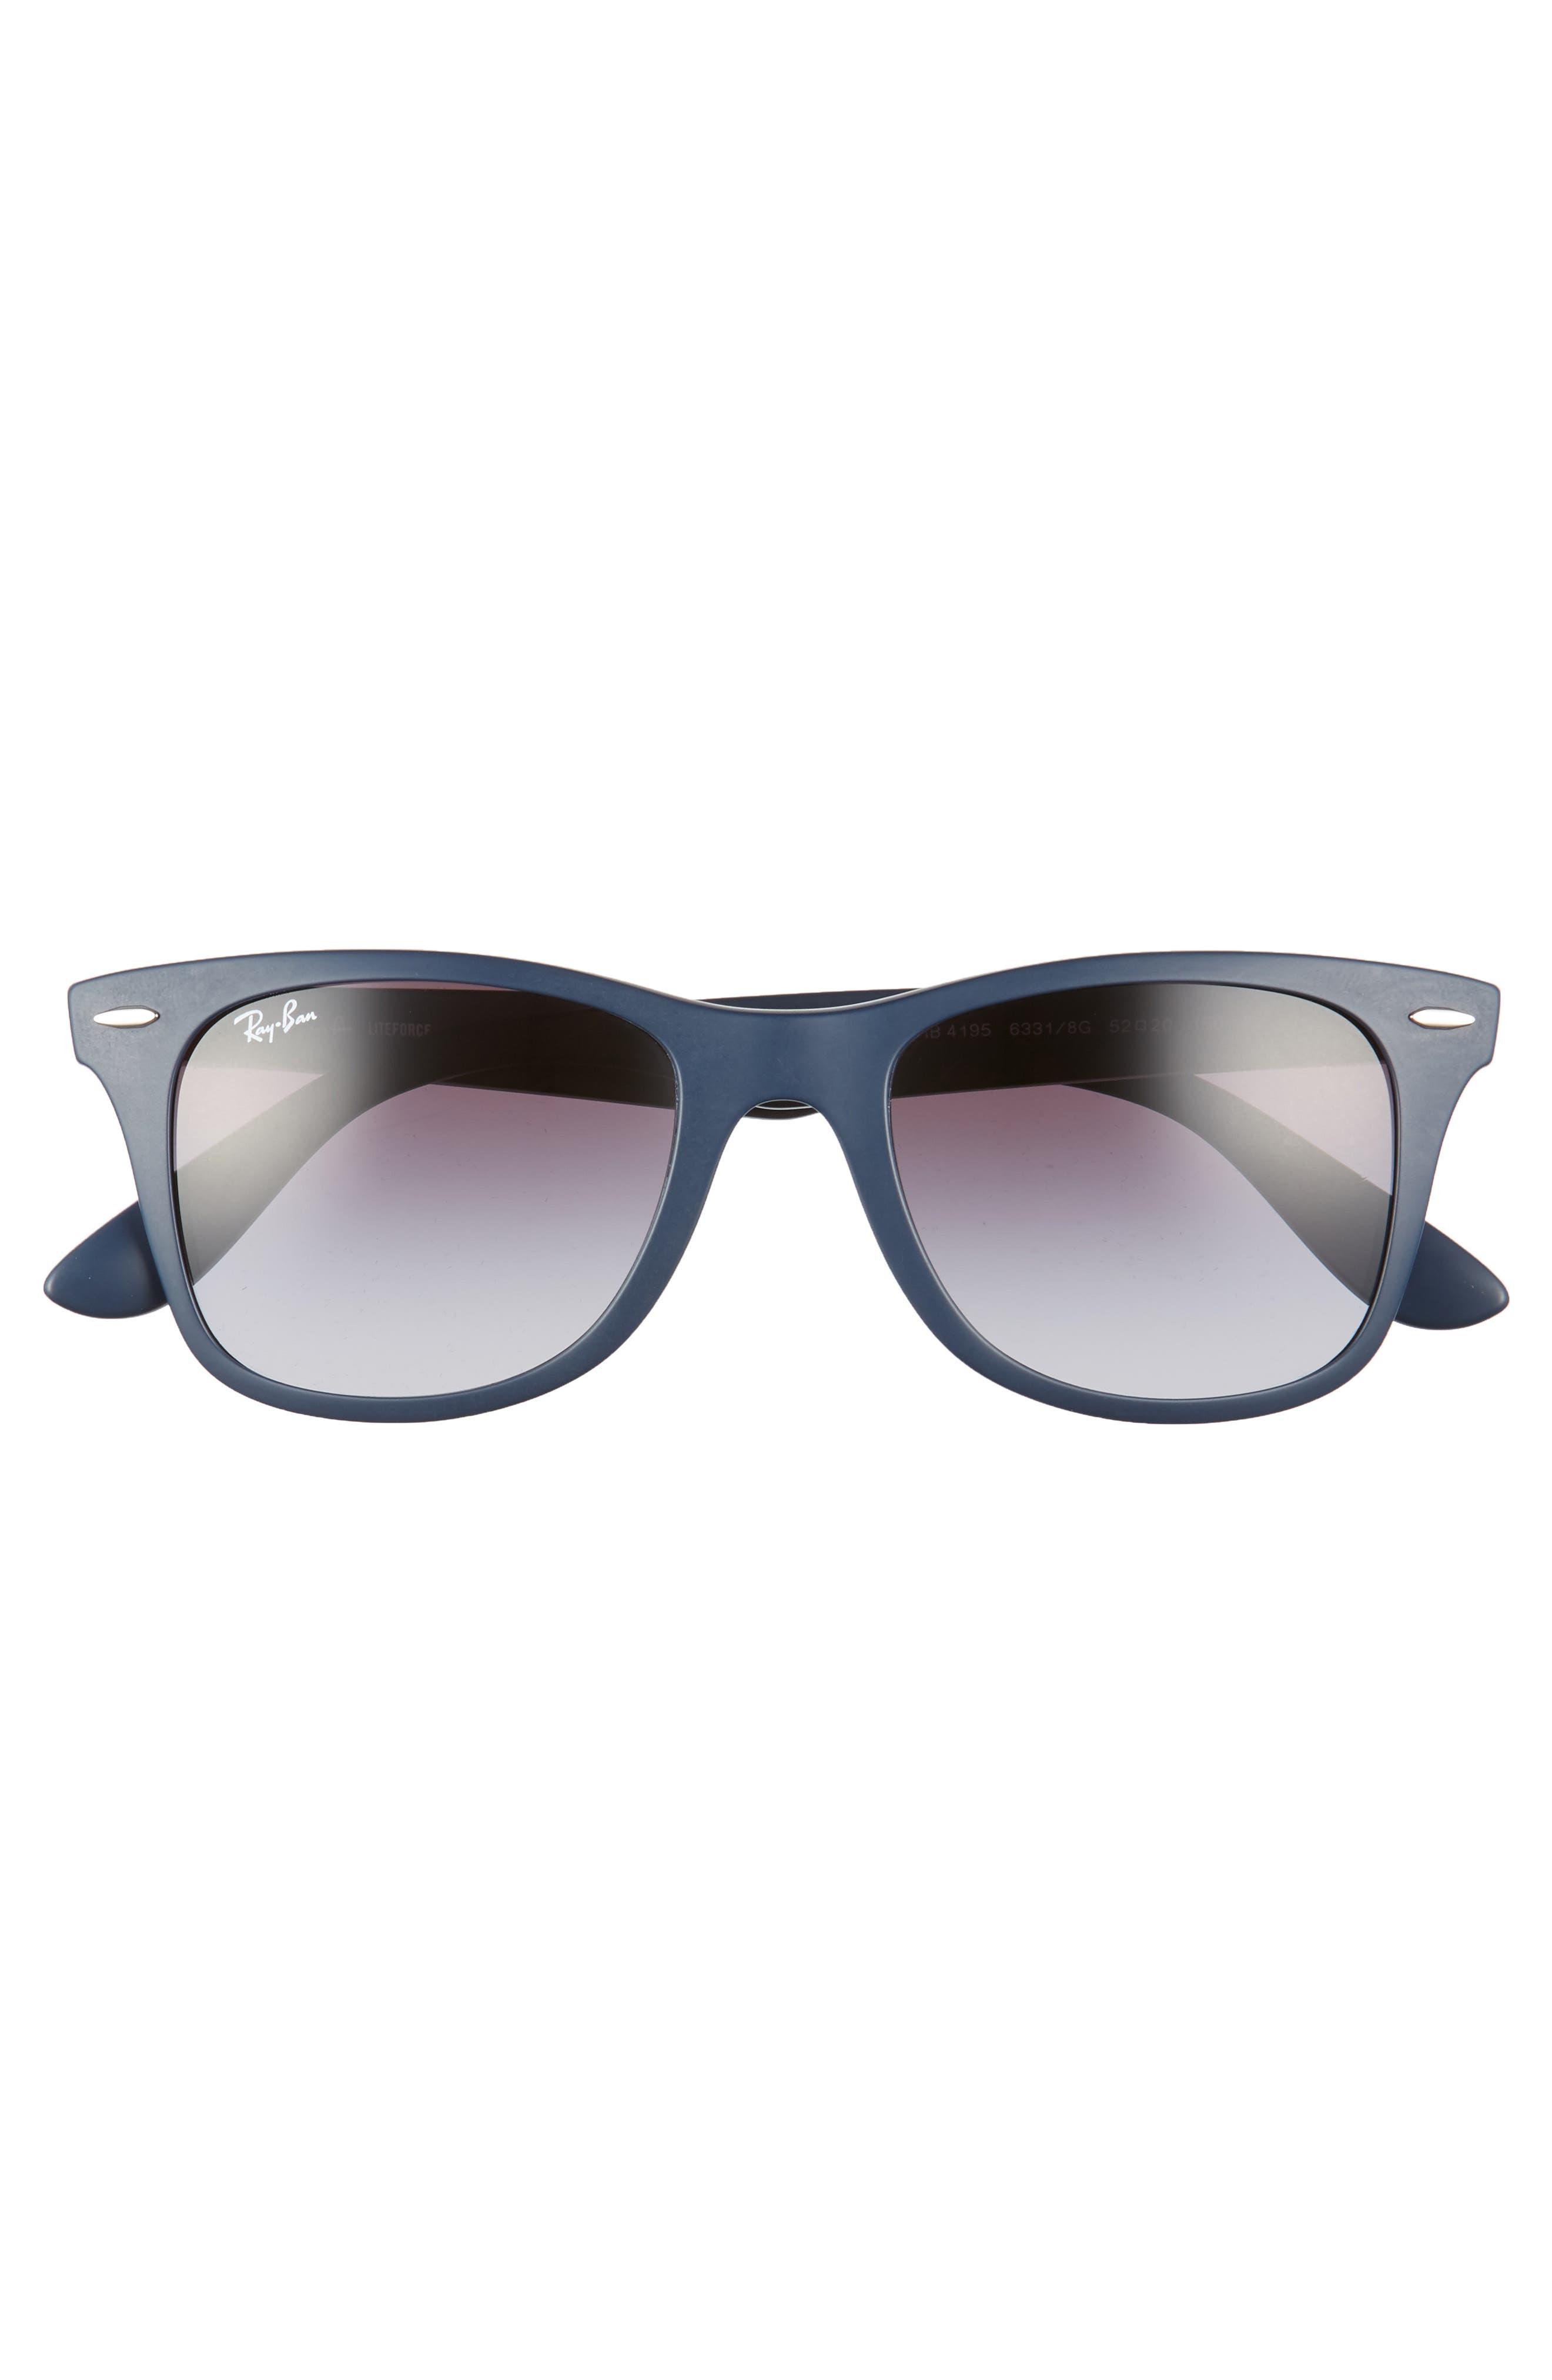 52mm Sunglasses,                             Alternate thumbnail 3, color,                             Blue/ Grey